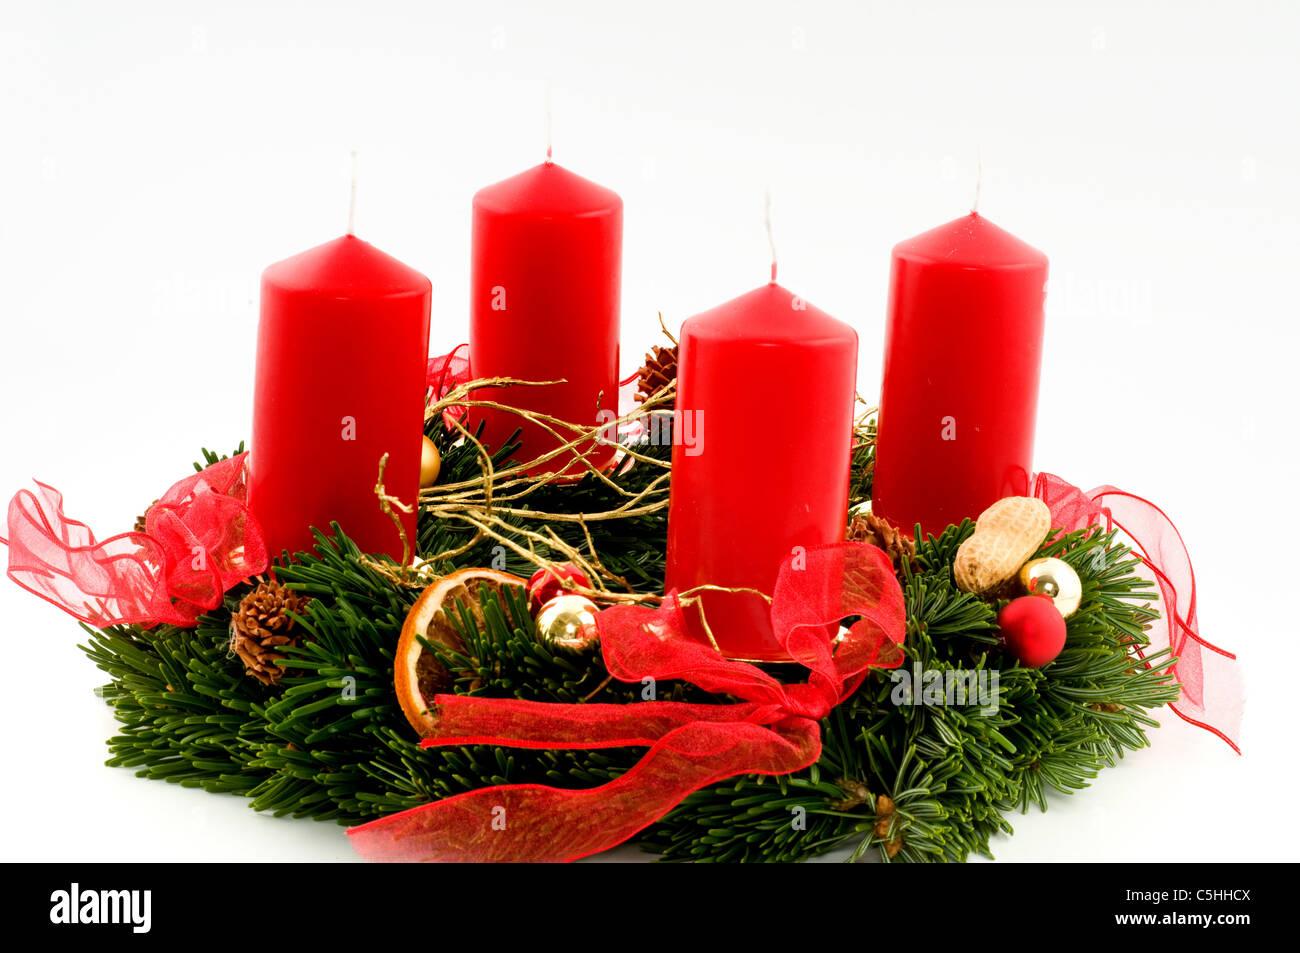 adventskranz mit roten kerzen stockfoto bild 37880890. Black Bedroom Furniture Sets. Home Design Ideas